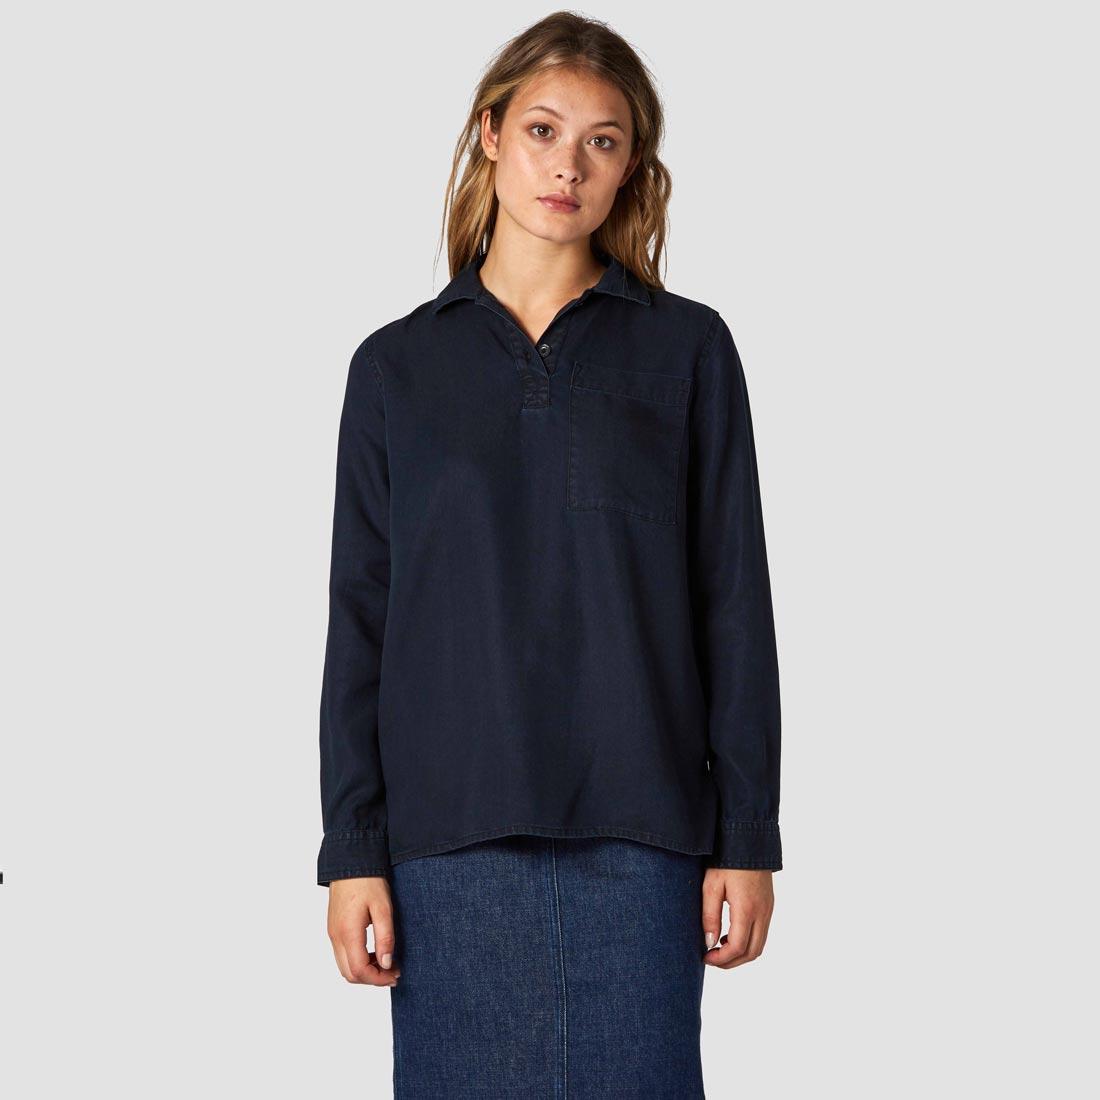 tencelblus pyjamasskjorta